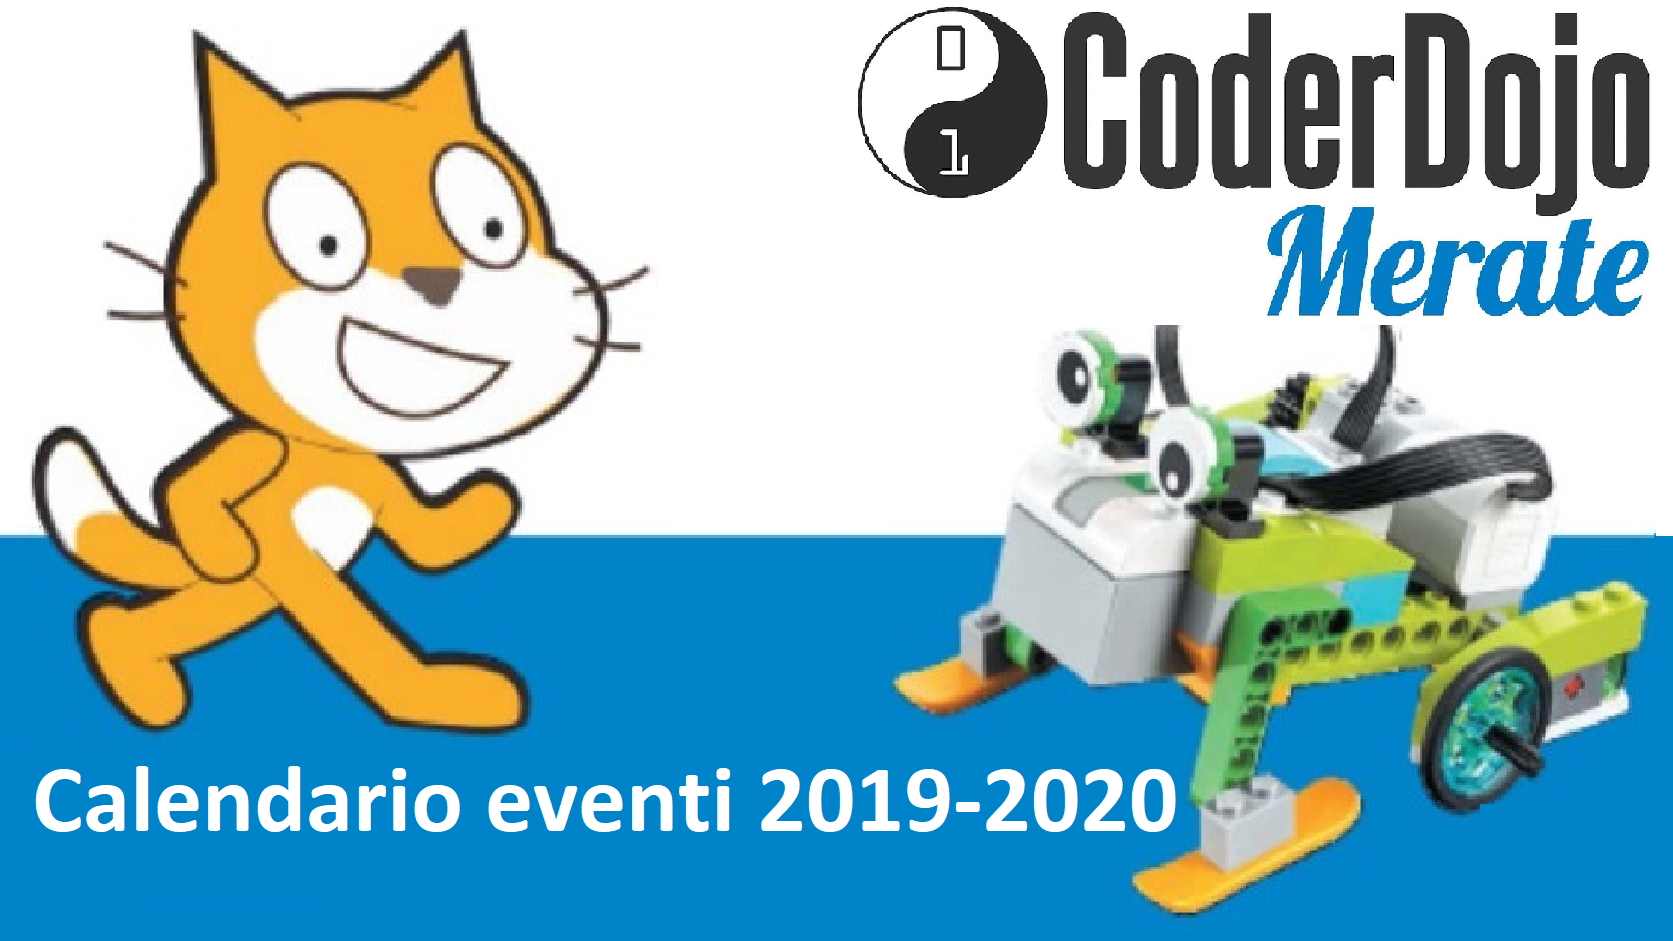 Calendario Eventi 2020.Coderdojomerate Codermerate Aps